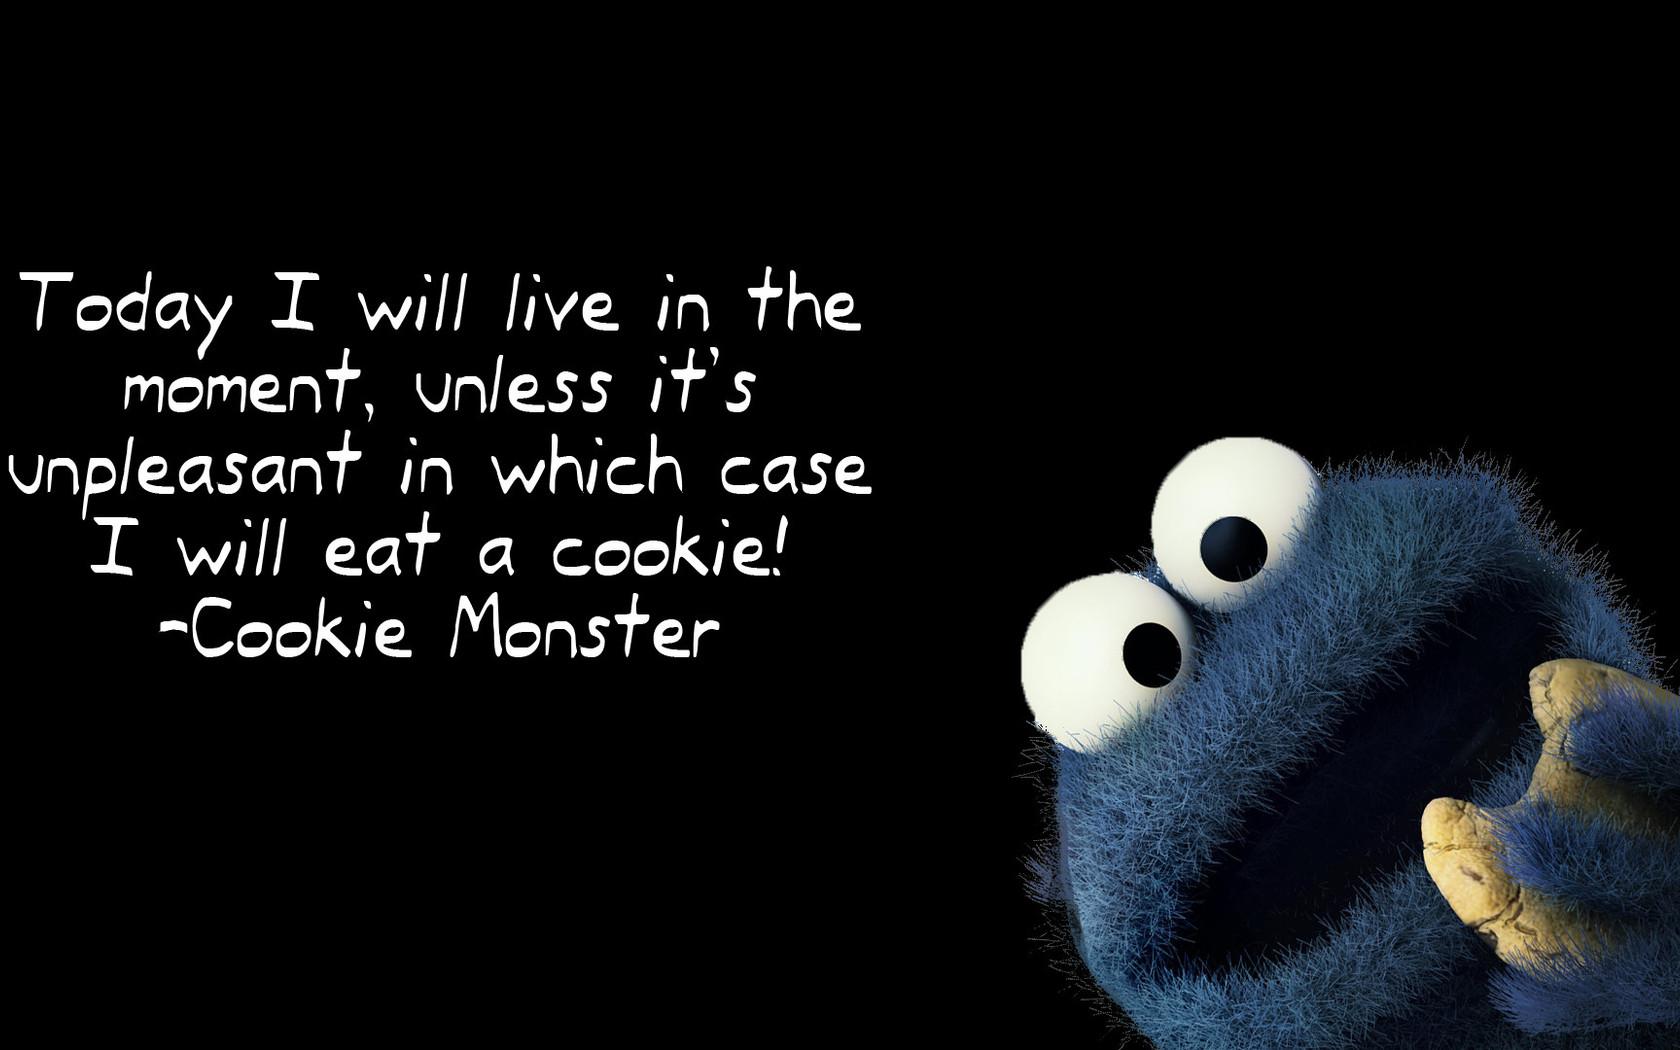 Cookie Monster quote wallpaper 17803 1680x1050